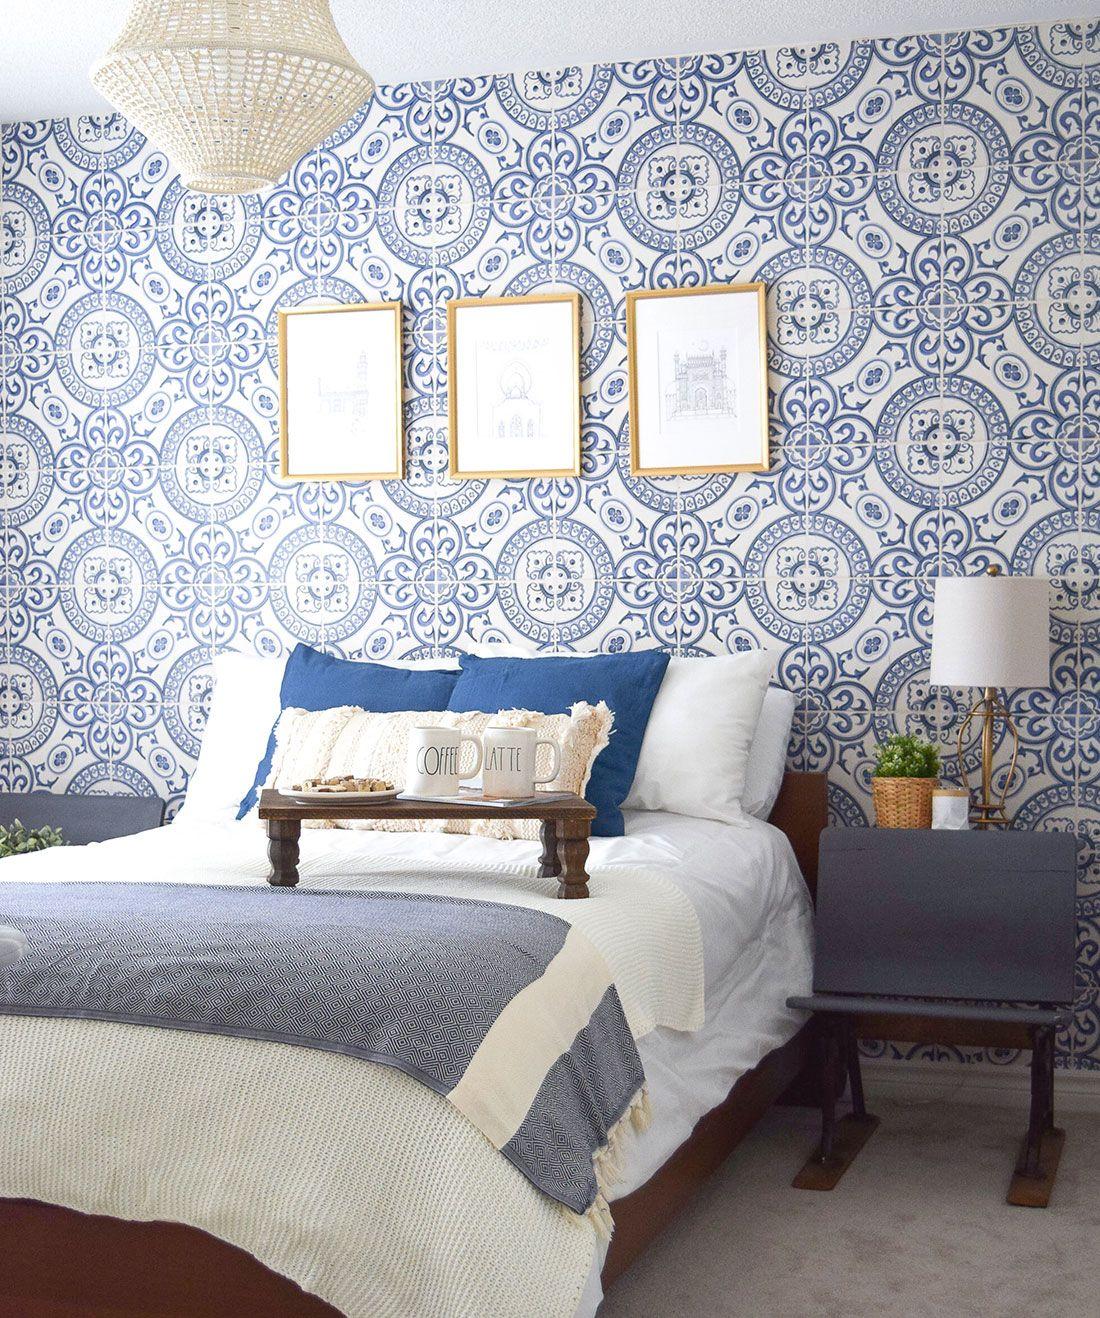 Heritage Tiles Wallpaper Authentic Cement Tile Design Milton King Wallpaper Bedroom Feature Wall Feature Wall Bedroom Master Bedroom Wallpaper